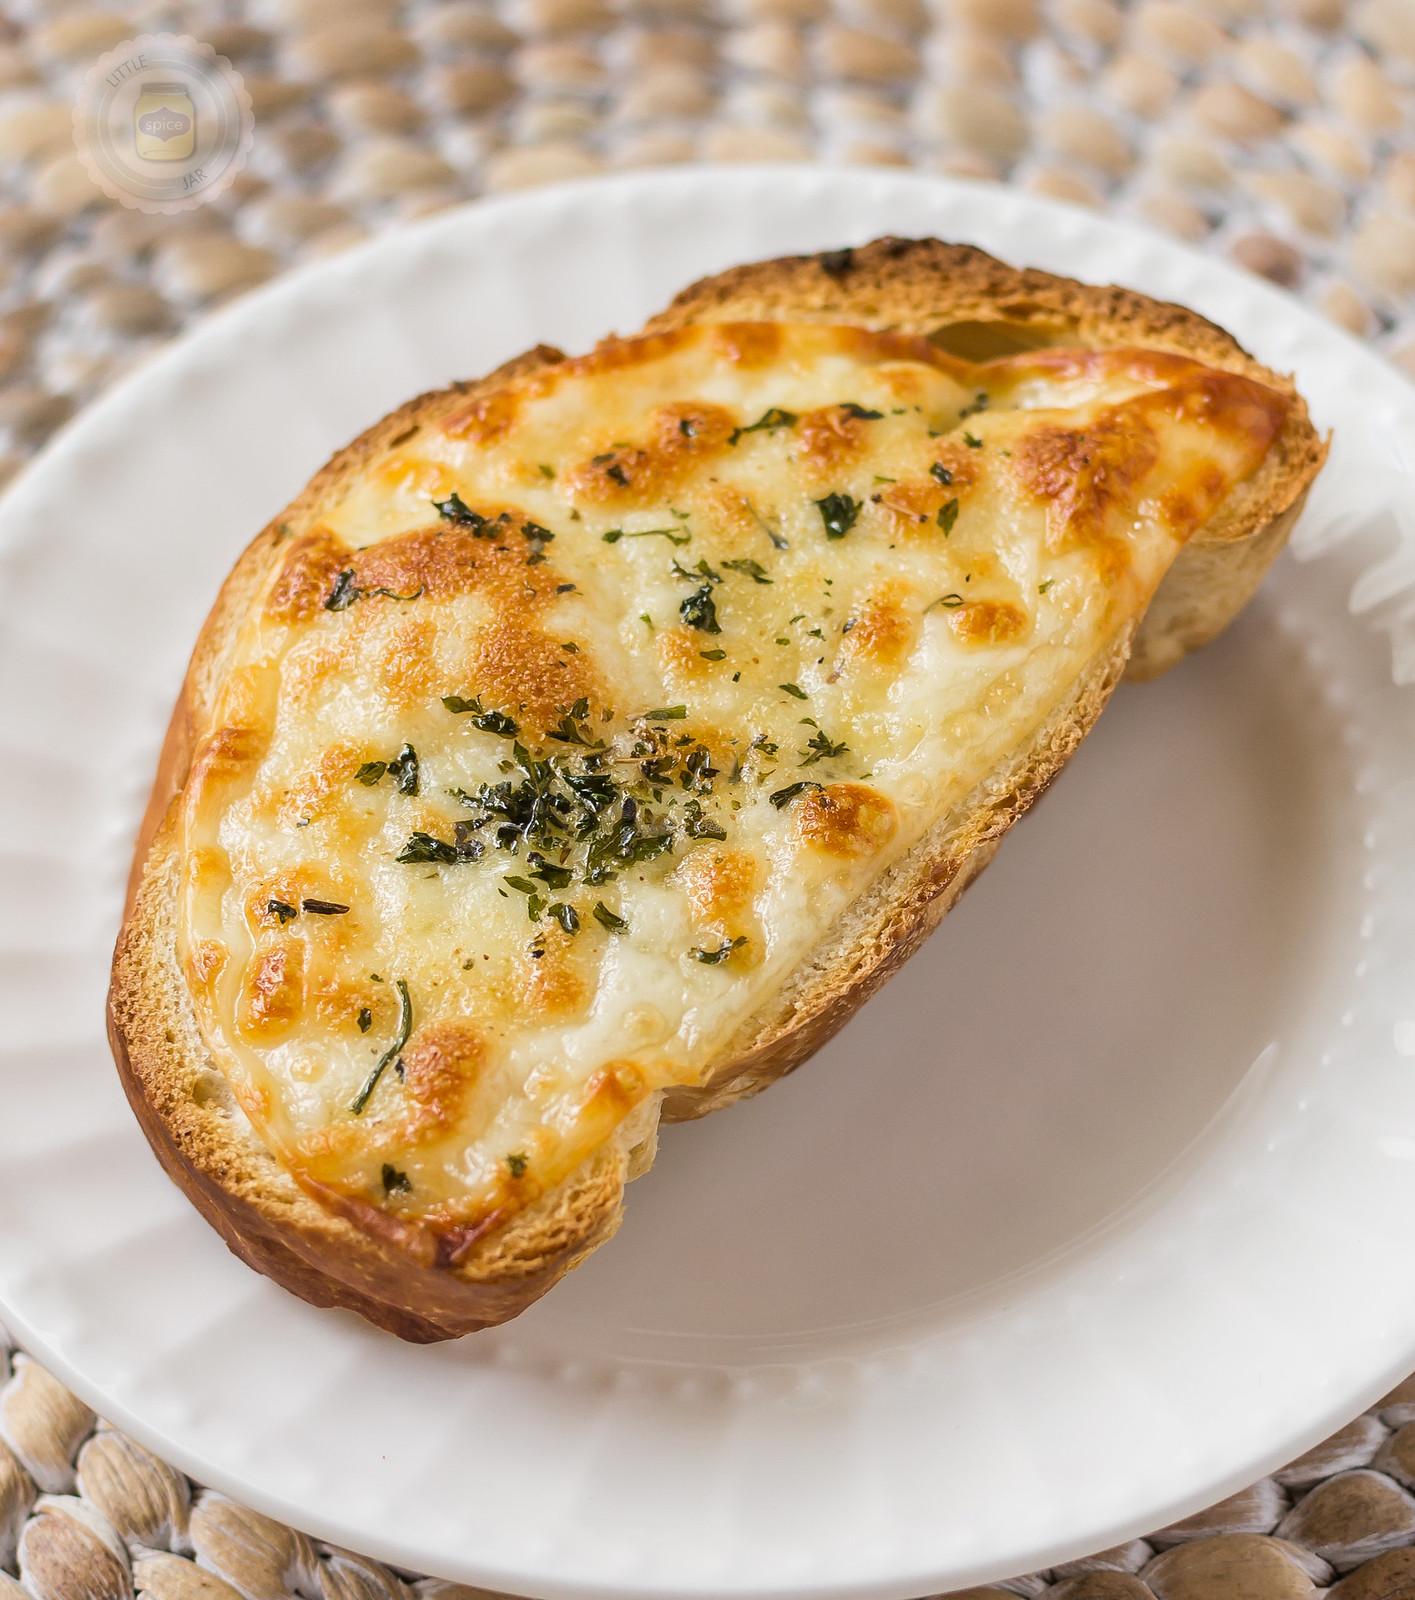 ... garlic bread. It's simple. Cheesy. Garlicky. Carby… deliciousness